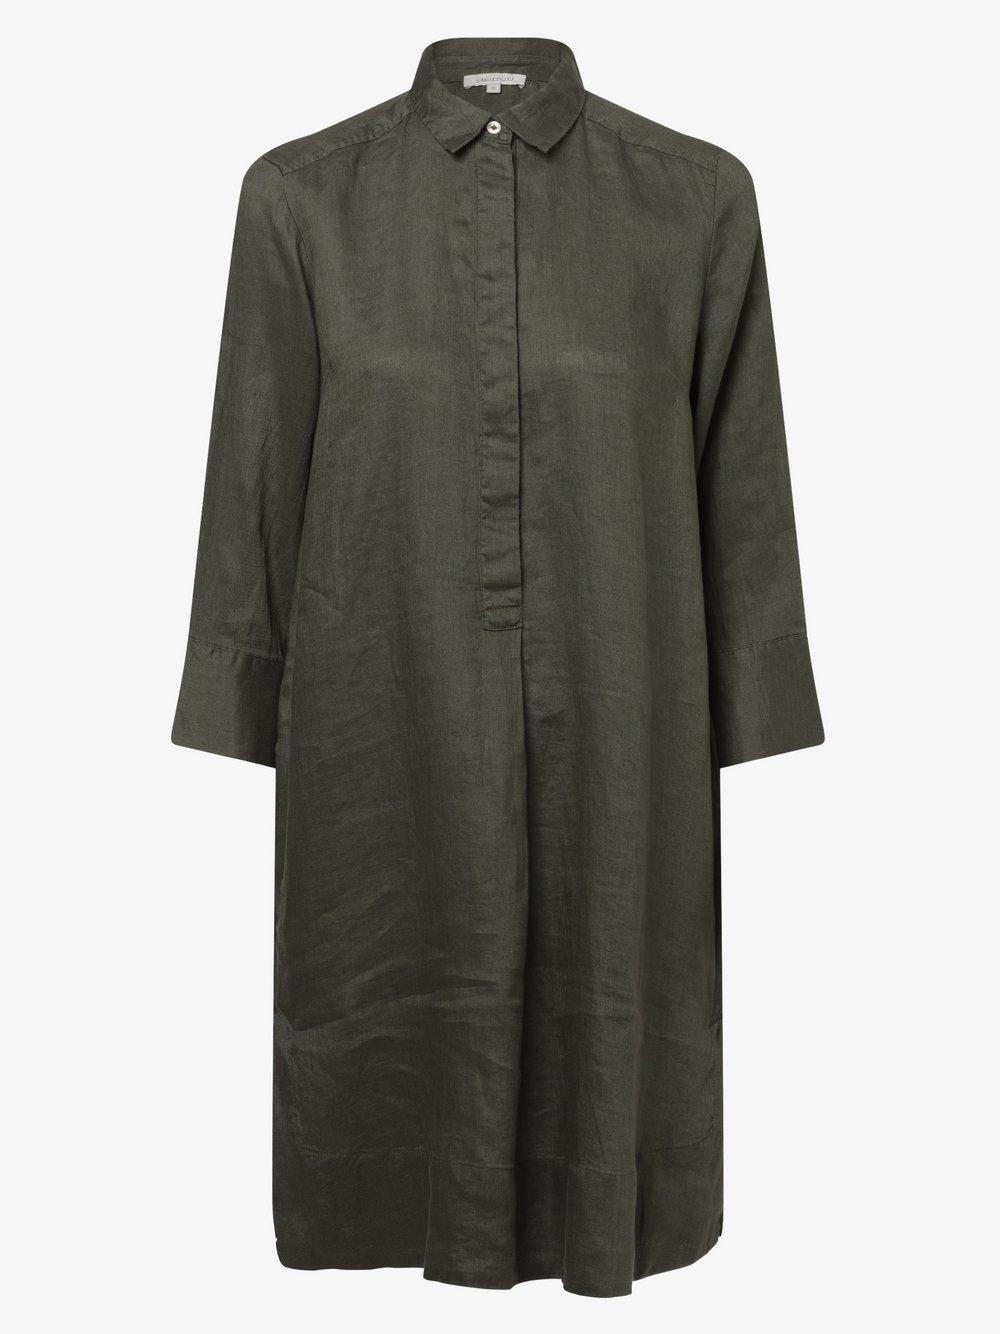 Apriori - Damska sukienka lniana, zielony